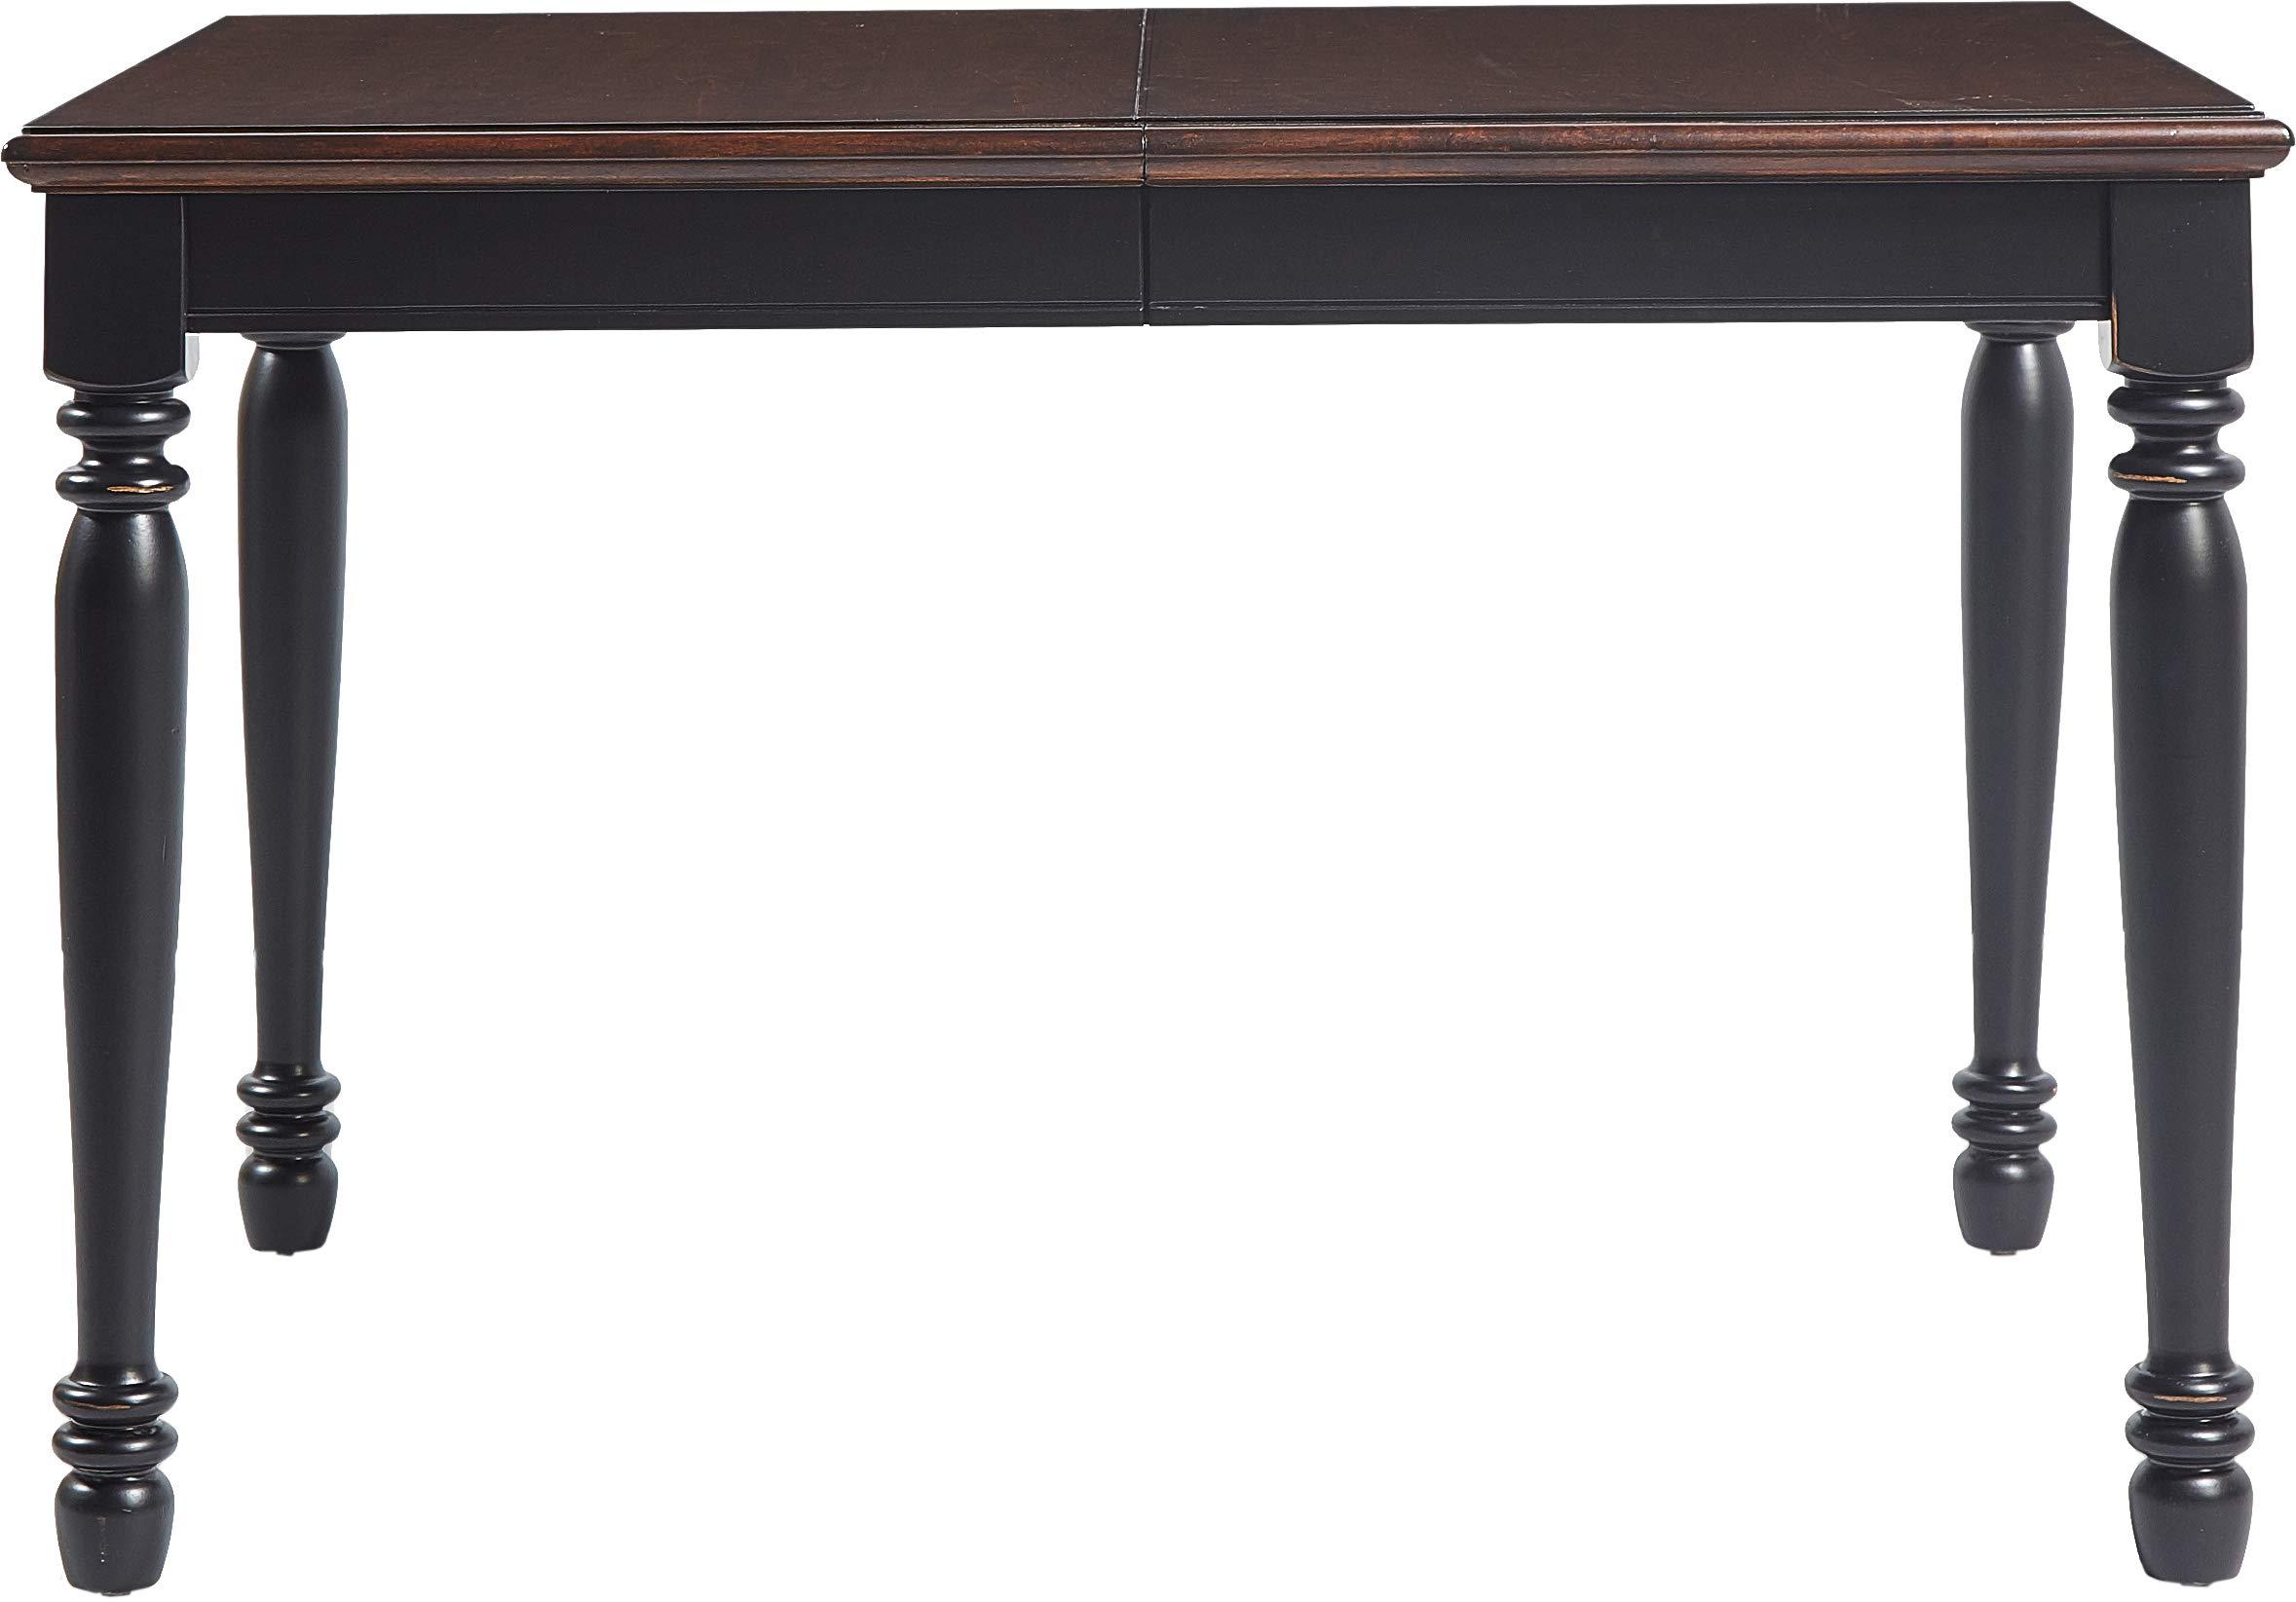 Crosley Furniture KF20001-BK Shelby 7-Piece Dining Set, Black by Crosley Furniture (Image #10)